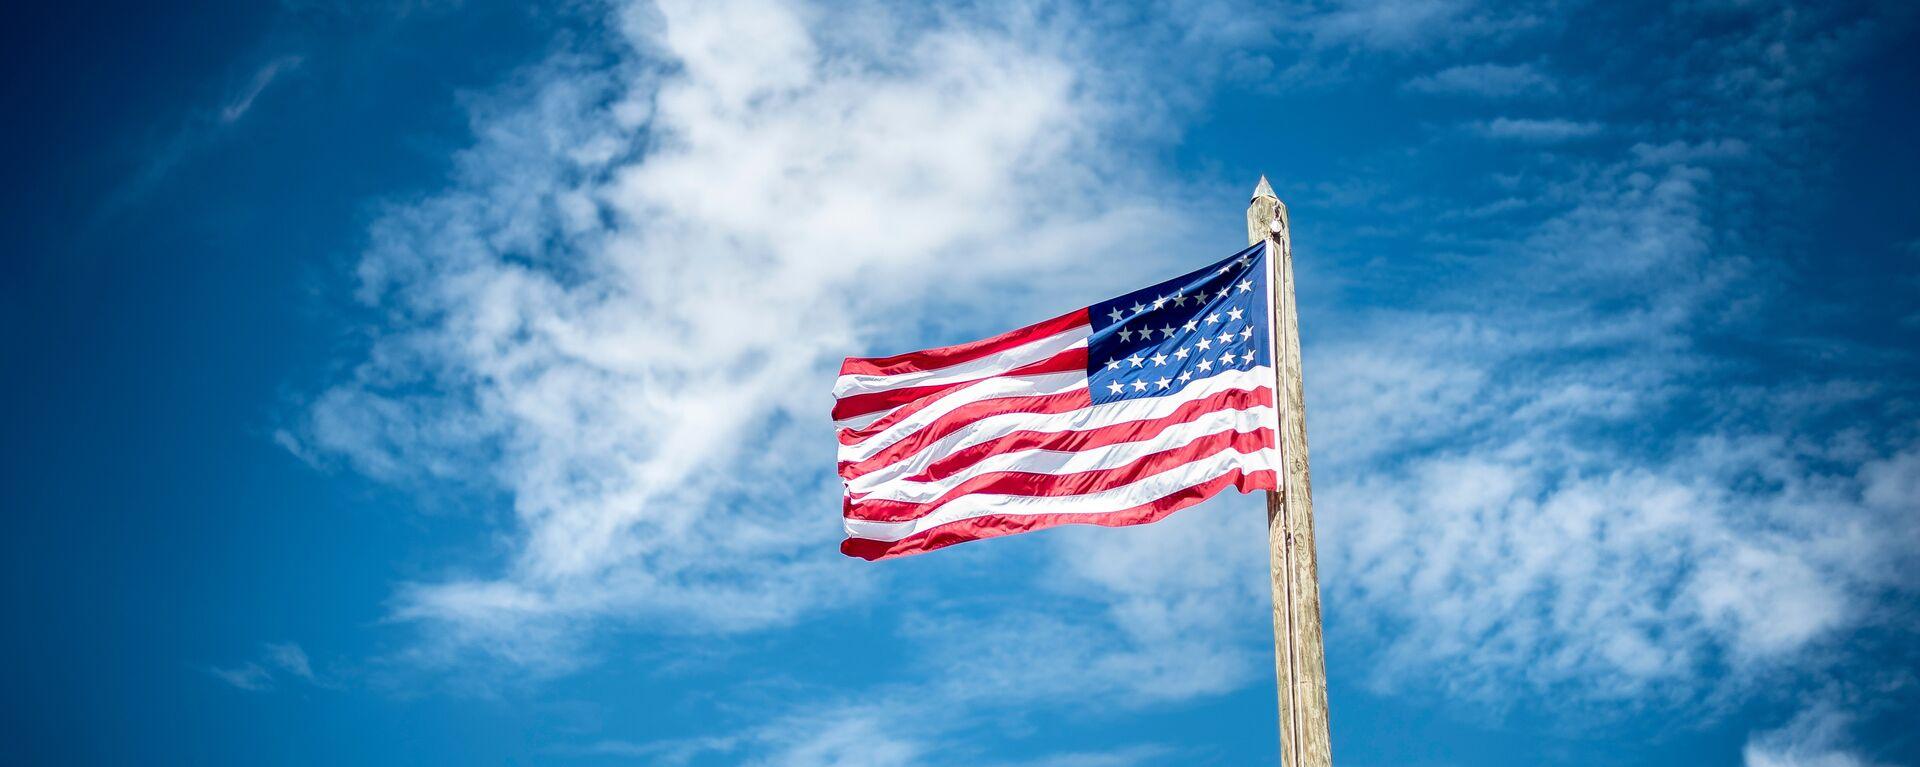 Bandera de EEUU - Sputnik Mundo, 1920, 22.07.2021